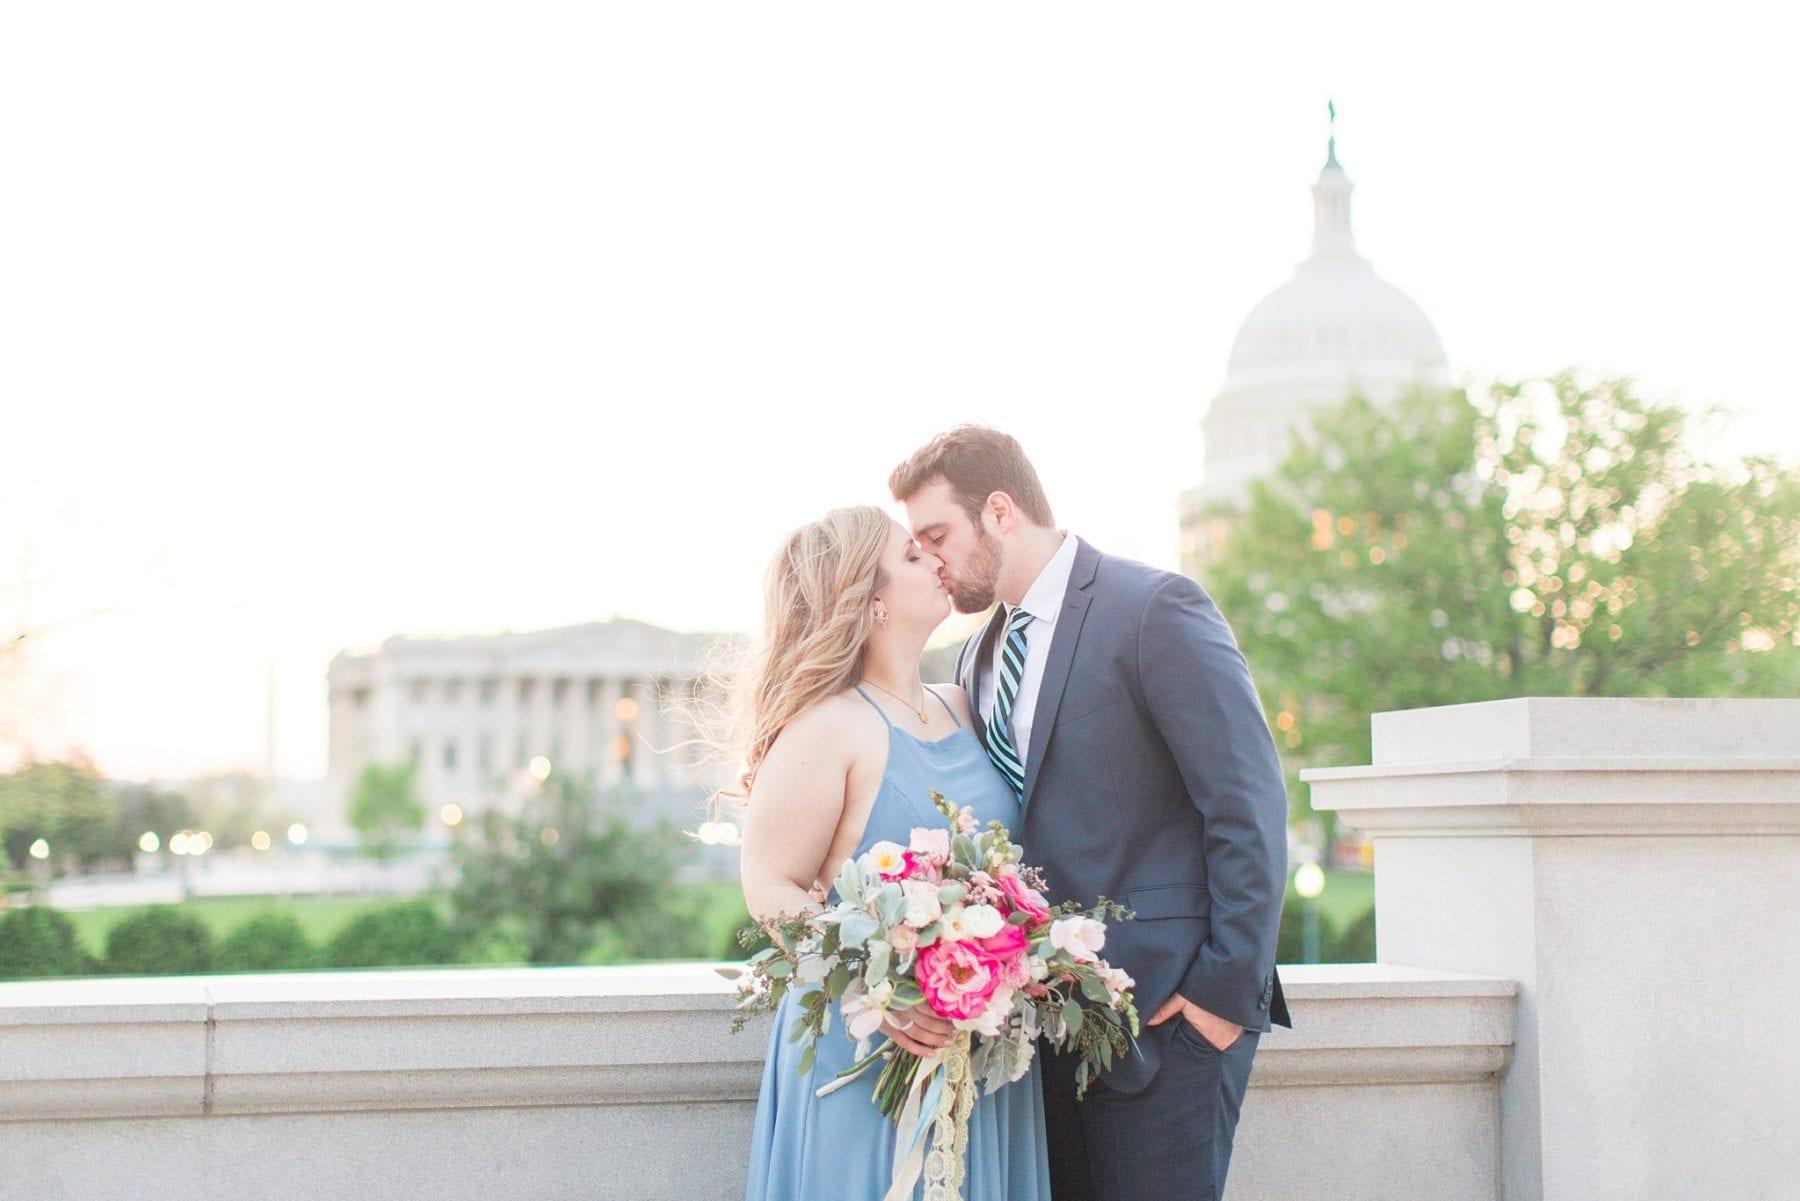 Capitol Hill Engagement Photos Kelly & Zach Washington DC Wedding Photographer Megan Kelsey Photography-362.jpg